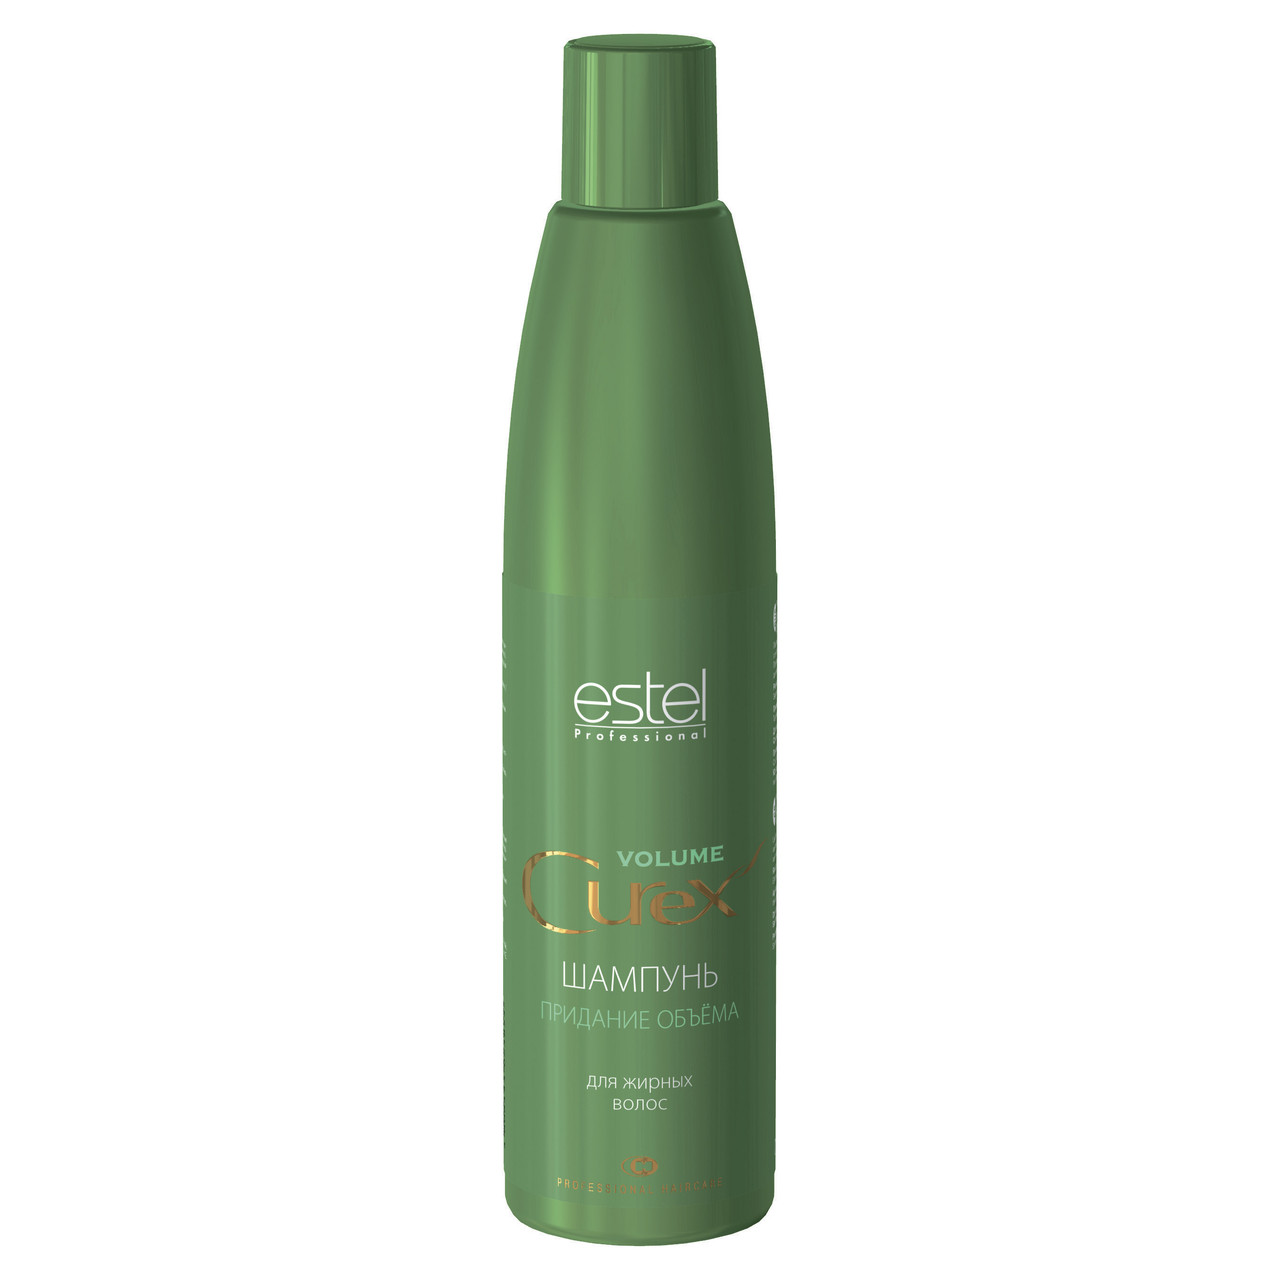 ESTEL CUREX VOLUME Шампунь для надання обєму для жирного волосся 250 мл